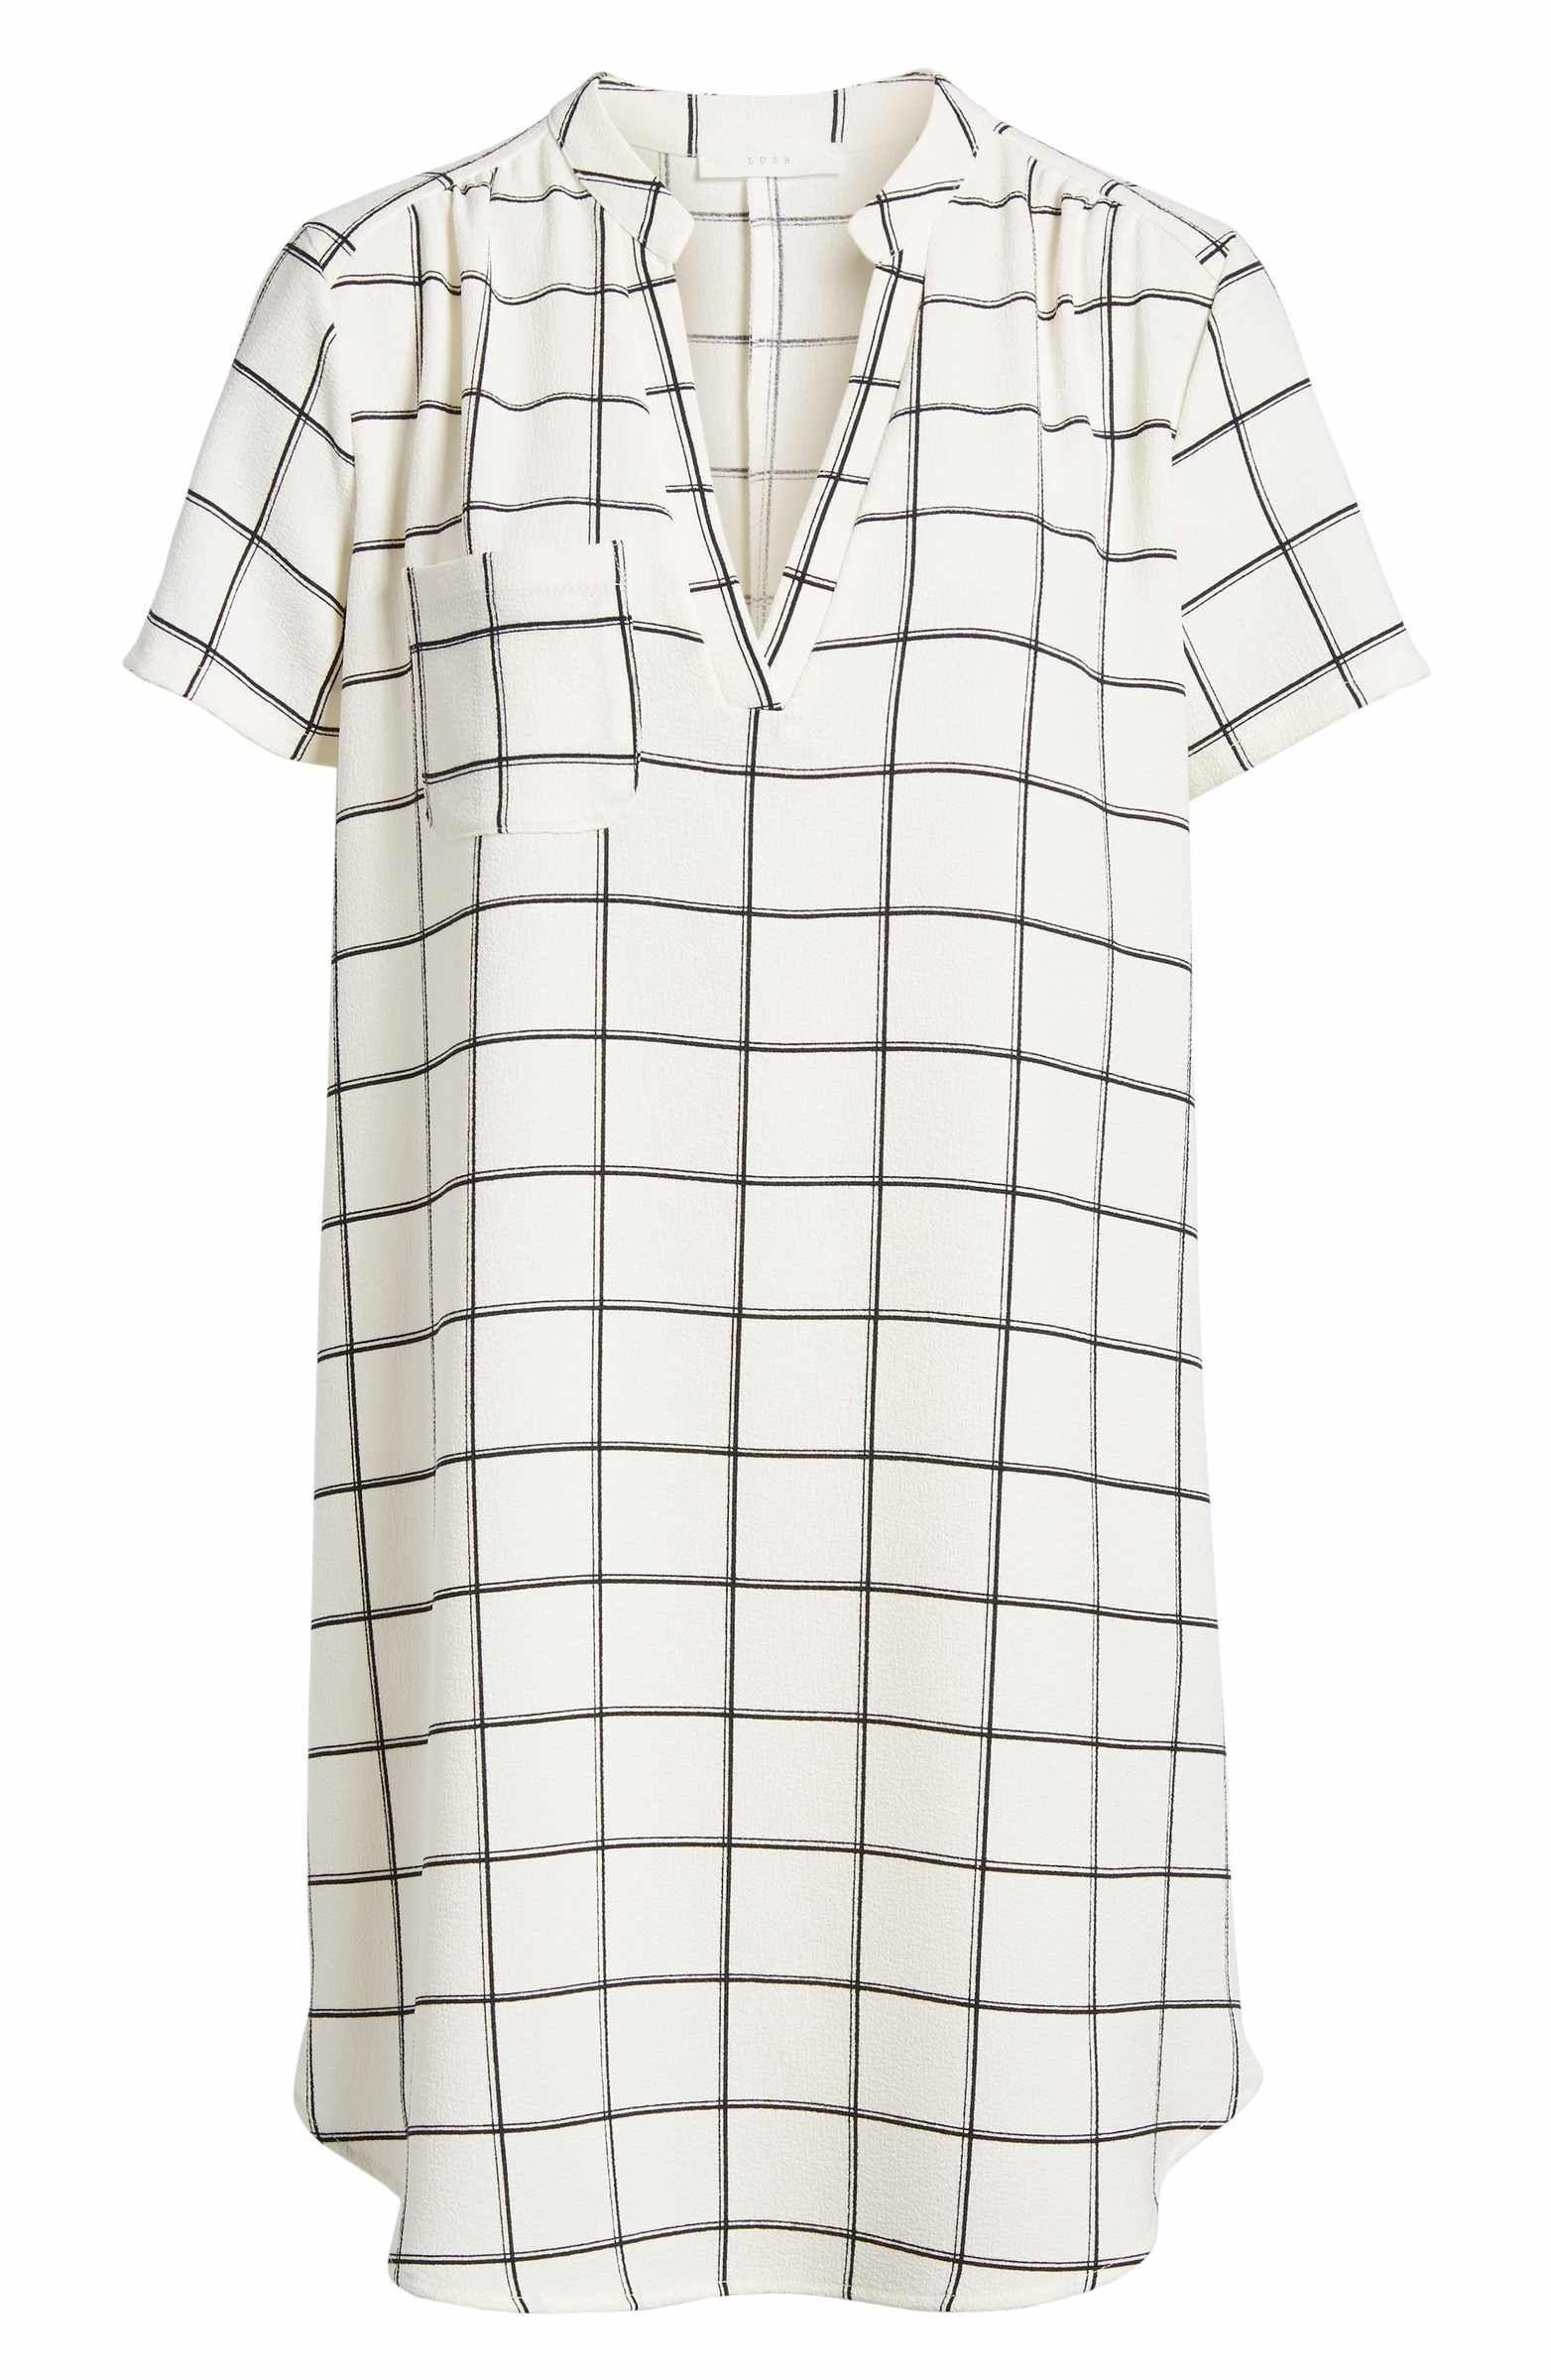 c6fb40a2a7 Women s Sheath Dresses · Silhouette · Pancakes · Sheath Dresses · Casual  Outfits · Main Image - Hailey Crepe Shift Dress